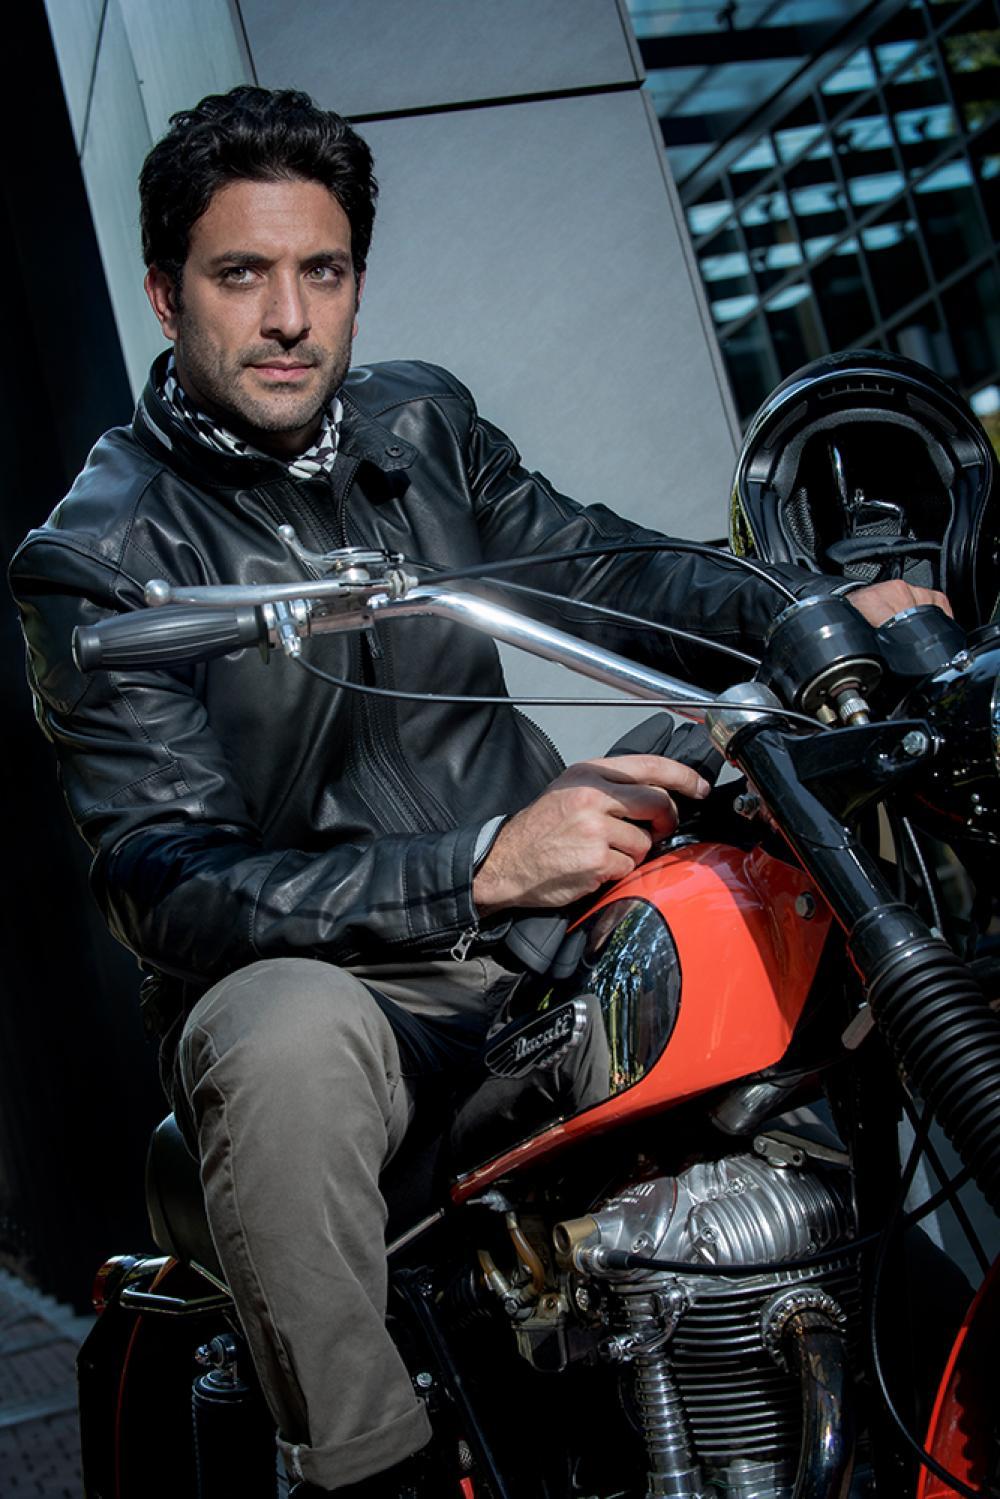 Urbano torna Eicma Motociclismo Tucano ad BgAnqq